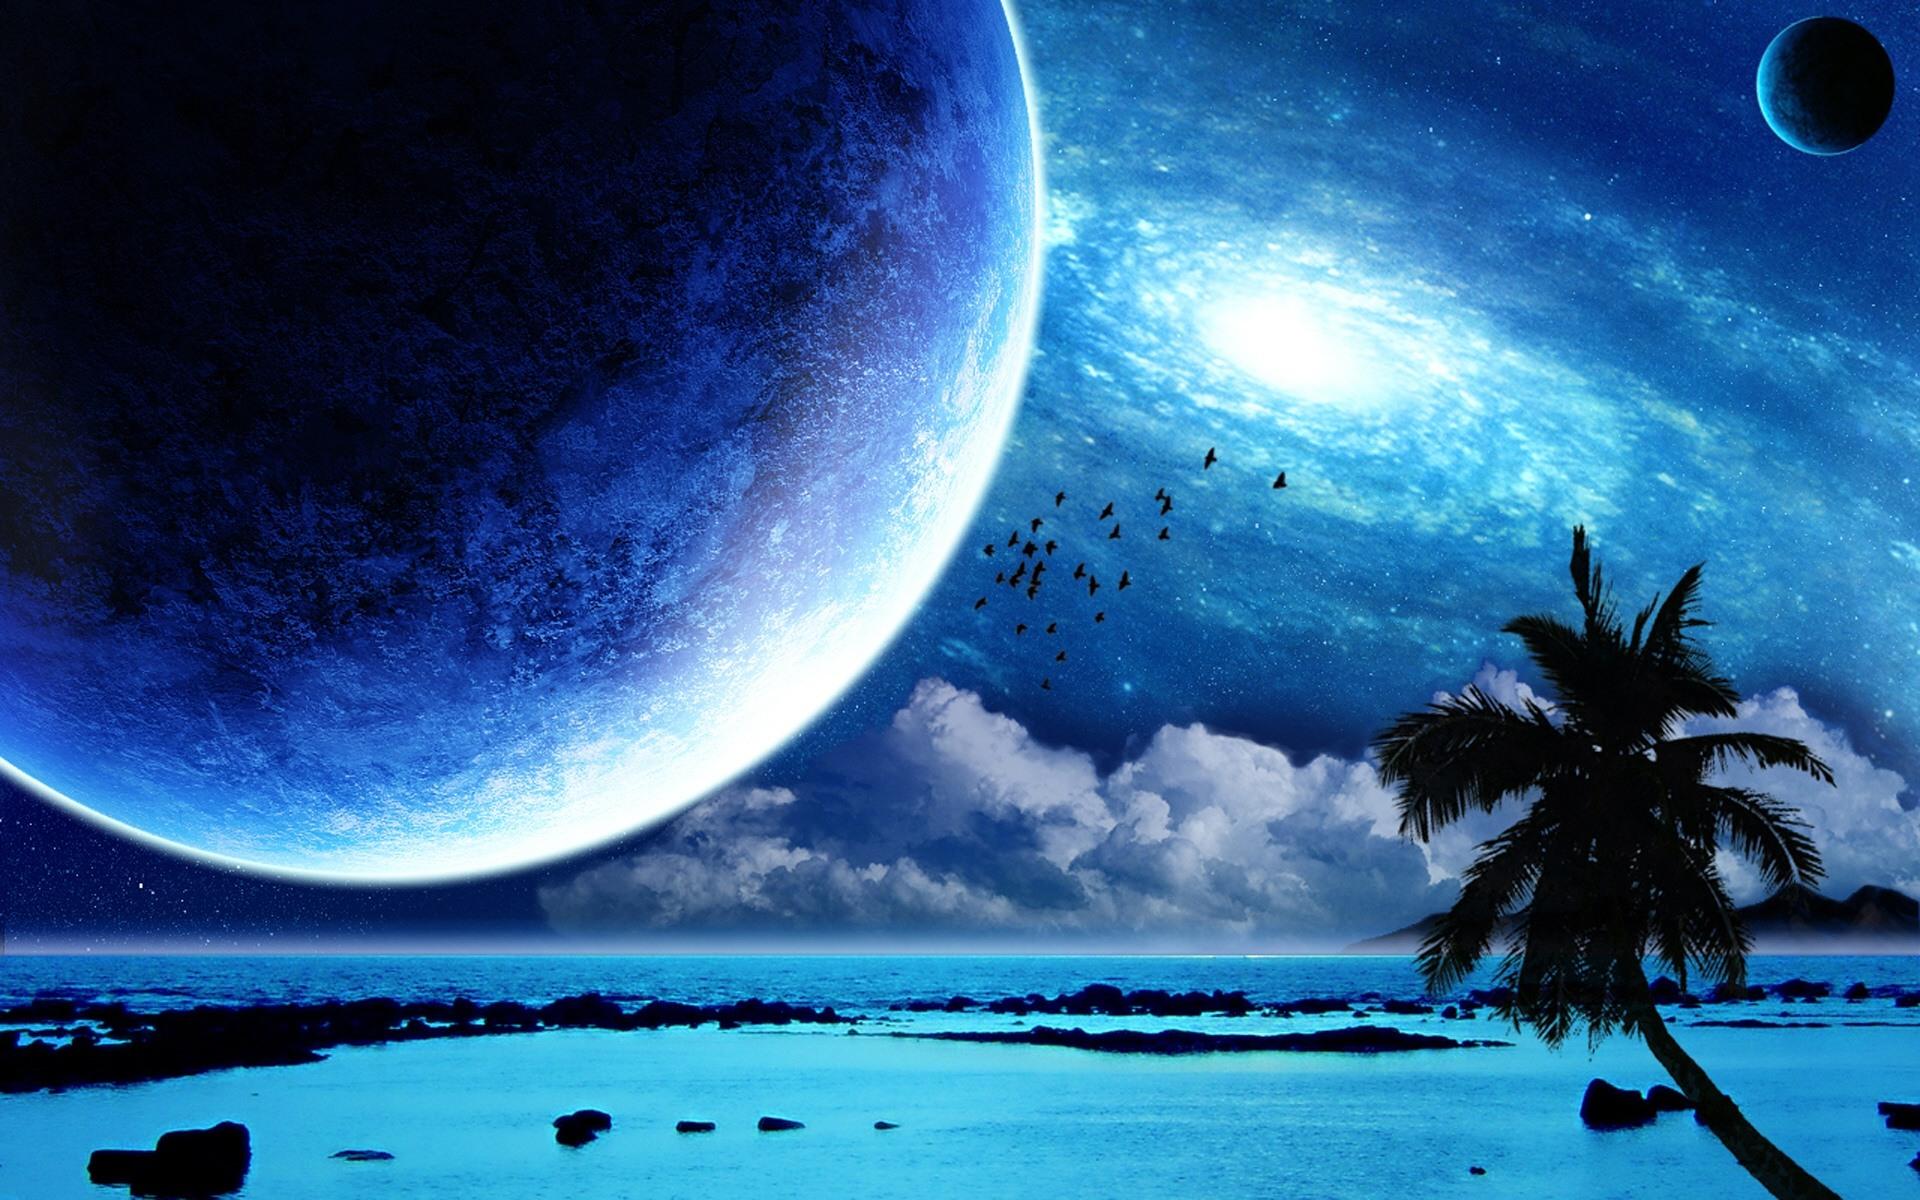 Interstellar Tropical Paradise desktop wallpaper 1920x1200